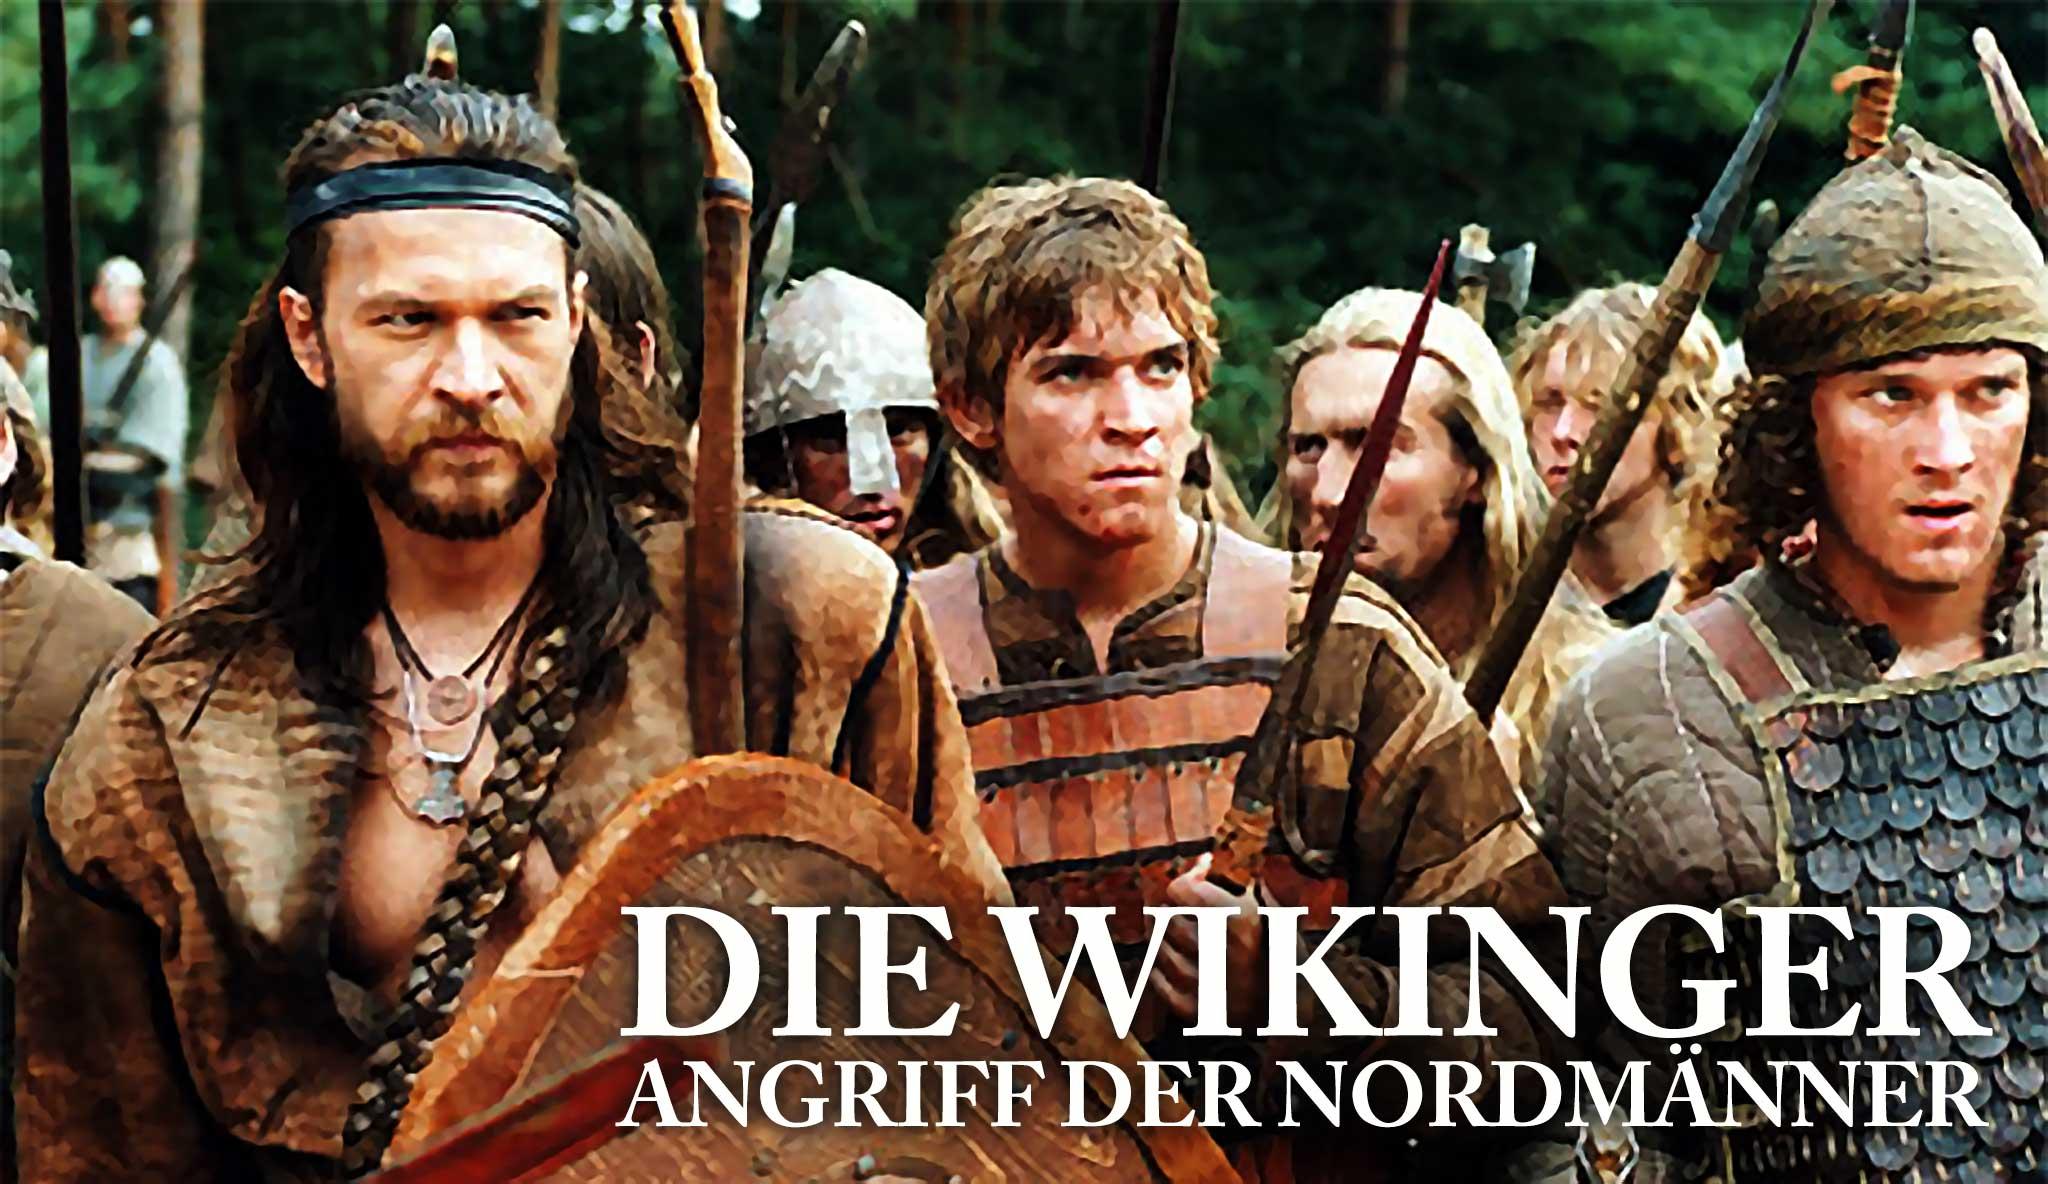 die-wikinger-angriff-der-nordmanner\header.jpg